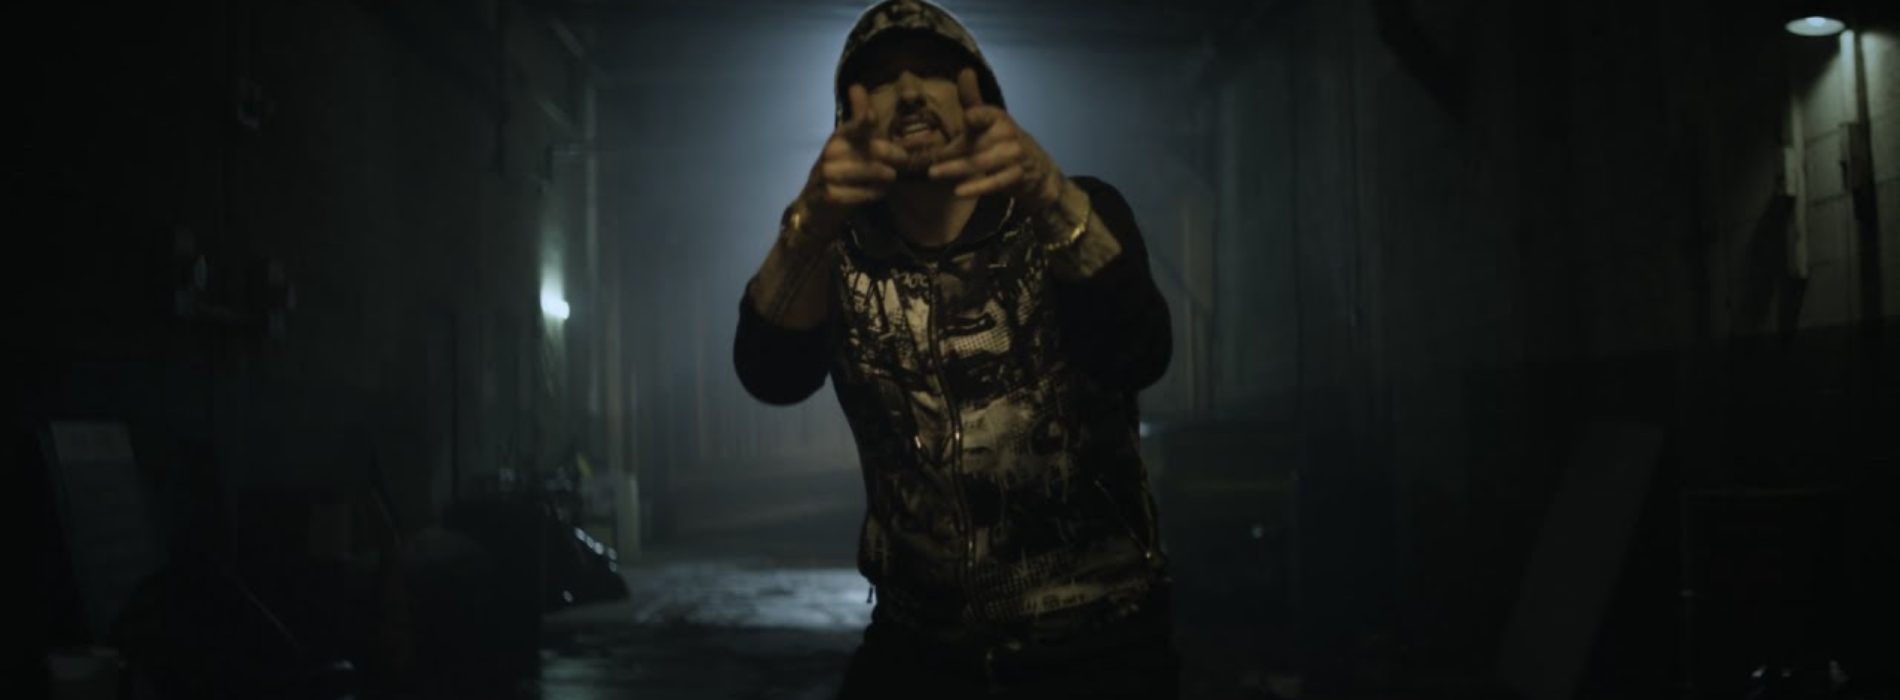 Eminem – Venom – [Clip Officiel] – Octobre 2018